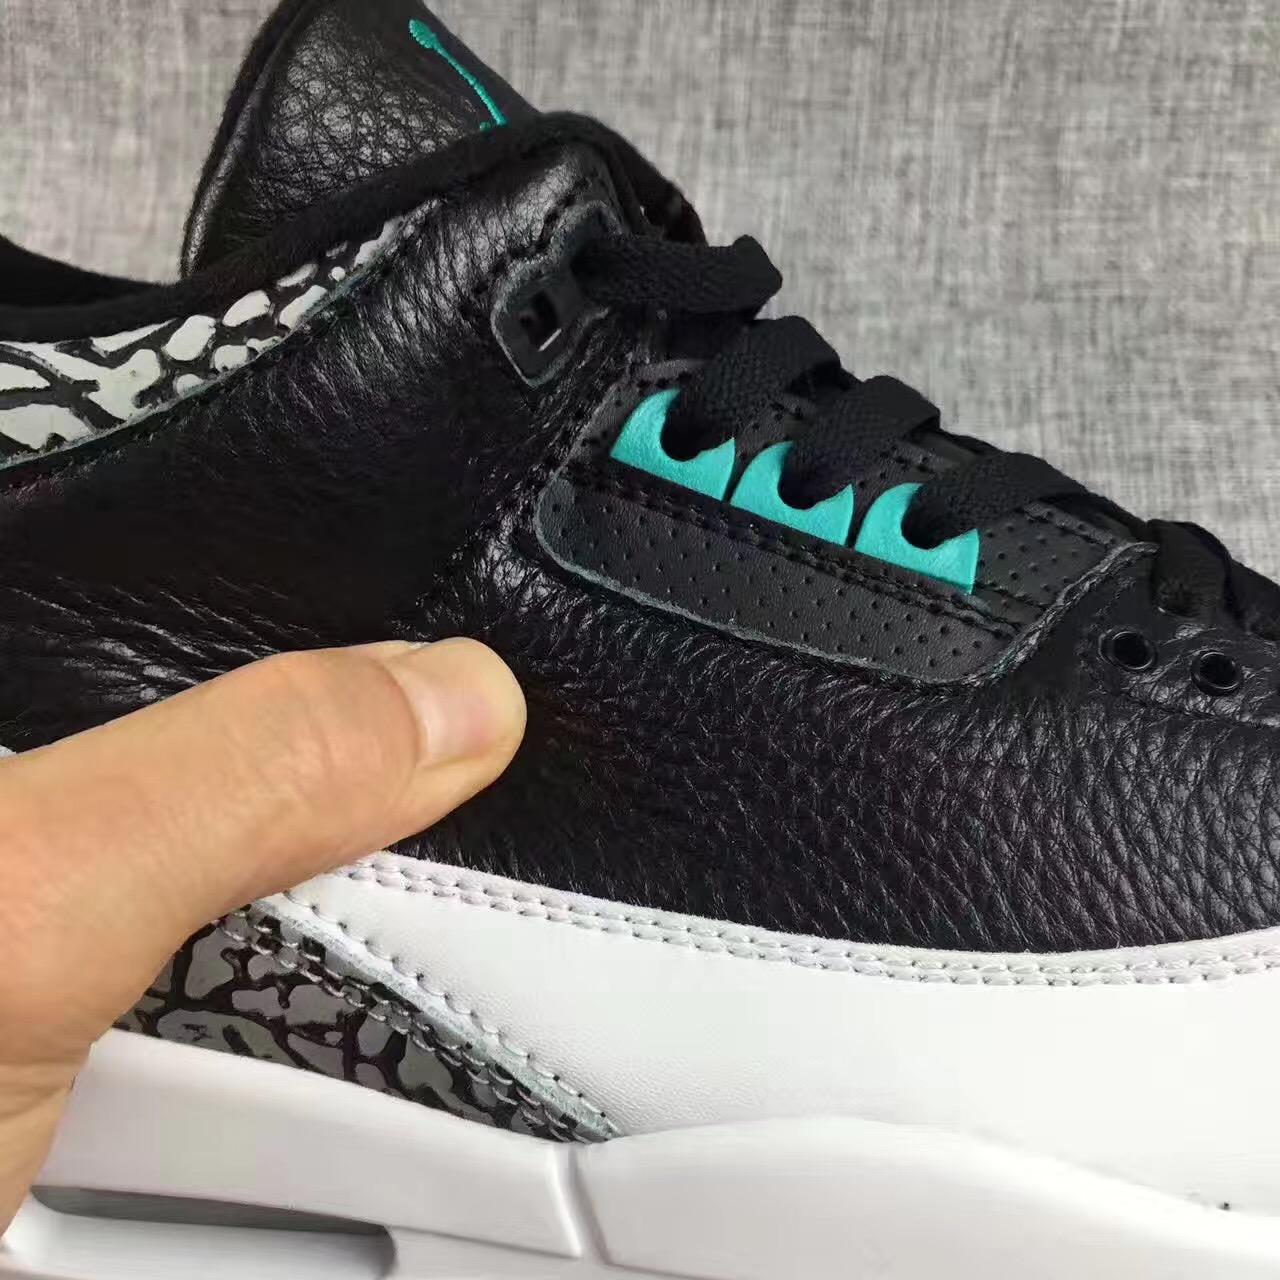 7c29c560a70 Fashion Men Basketball Air Retro 3 Shoes On Sale · YogaCloth ...